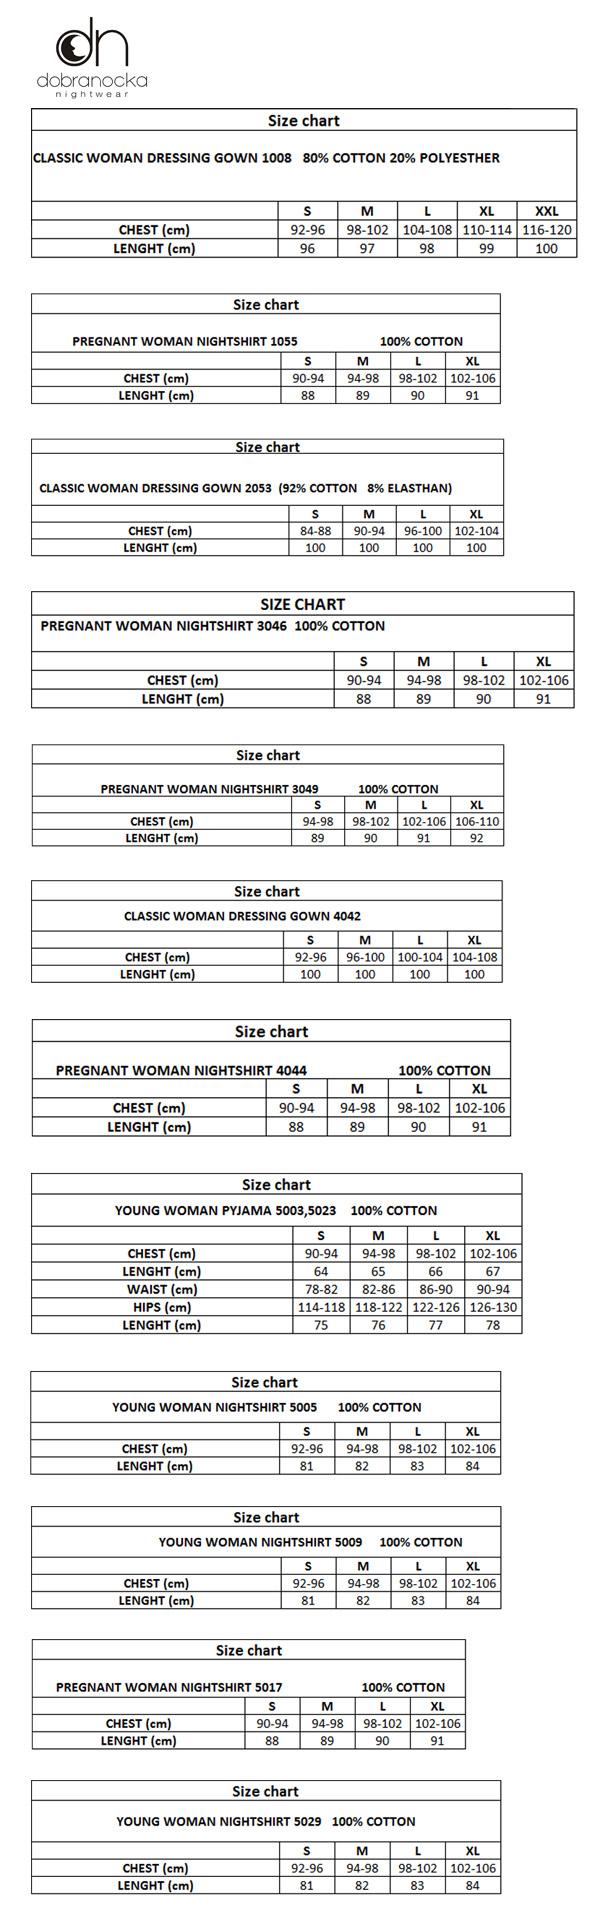 Dobranocka size chart